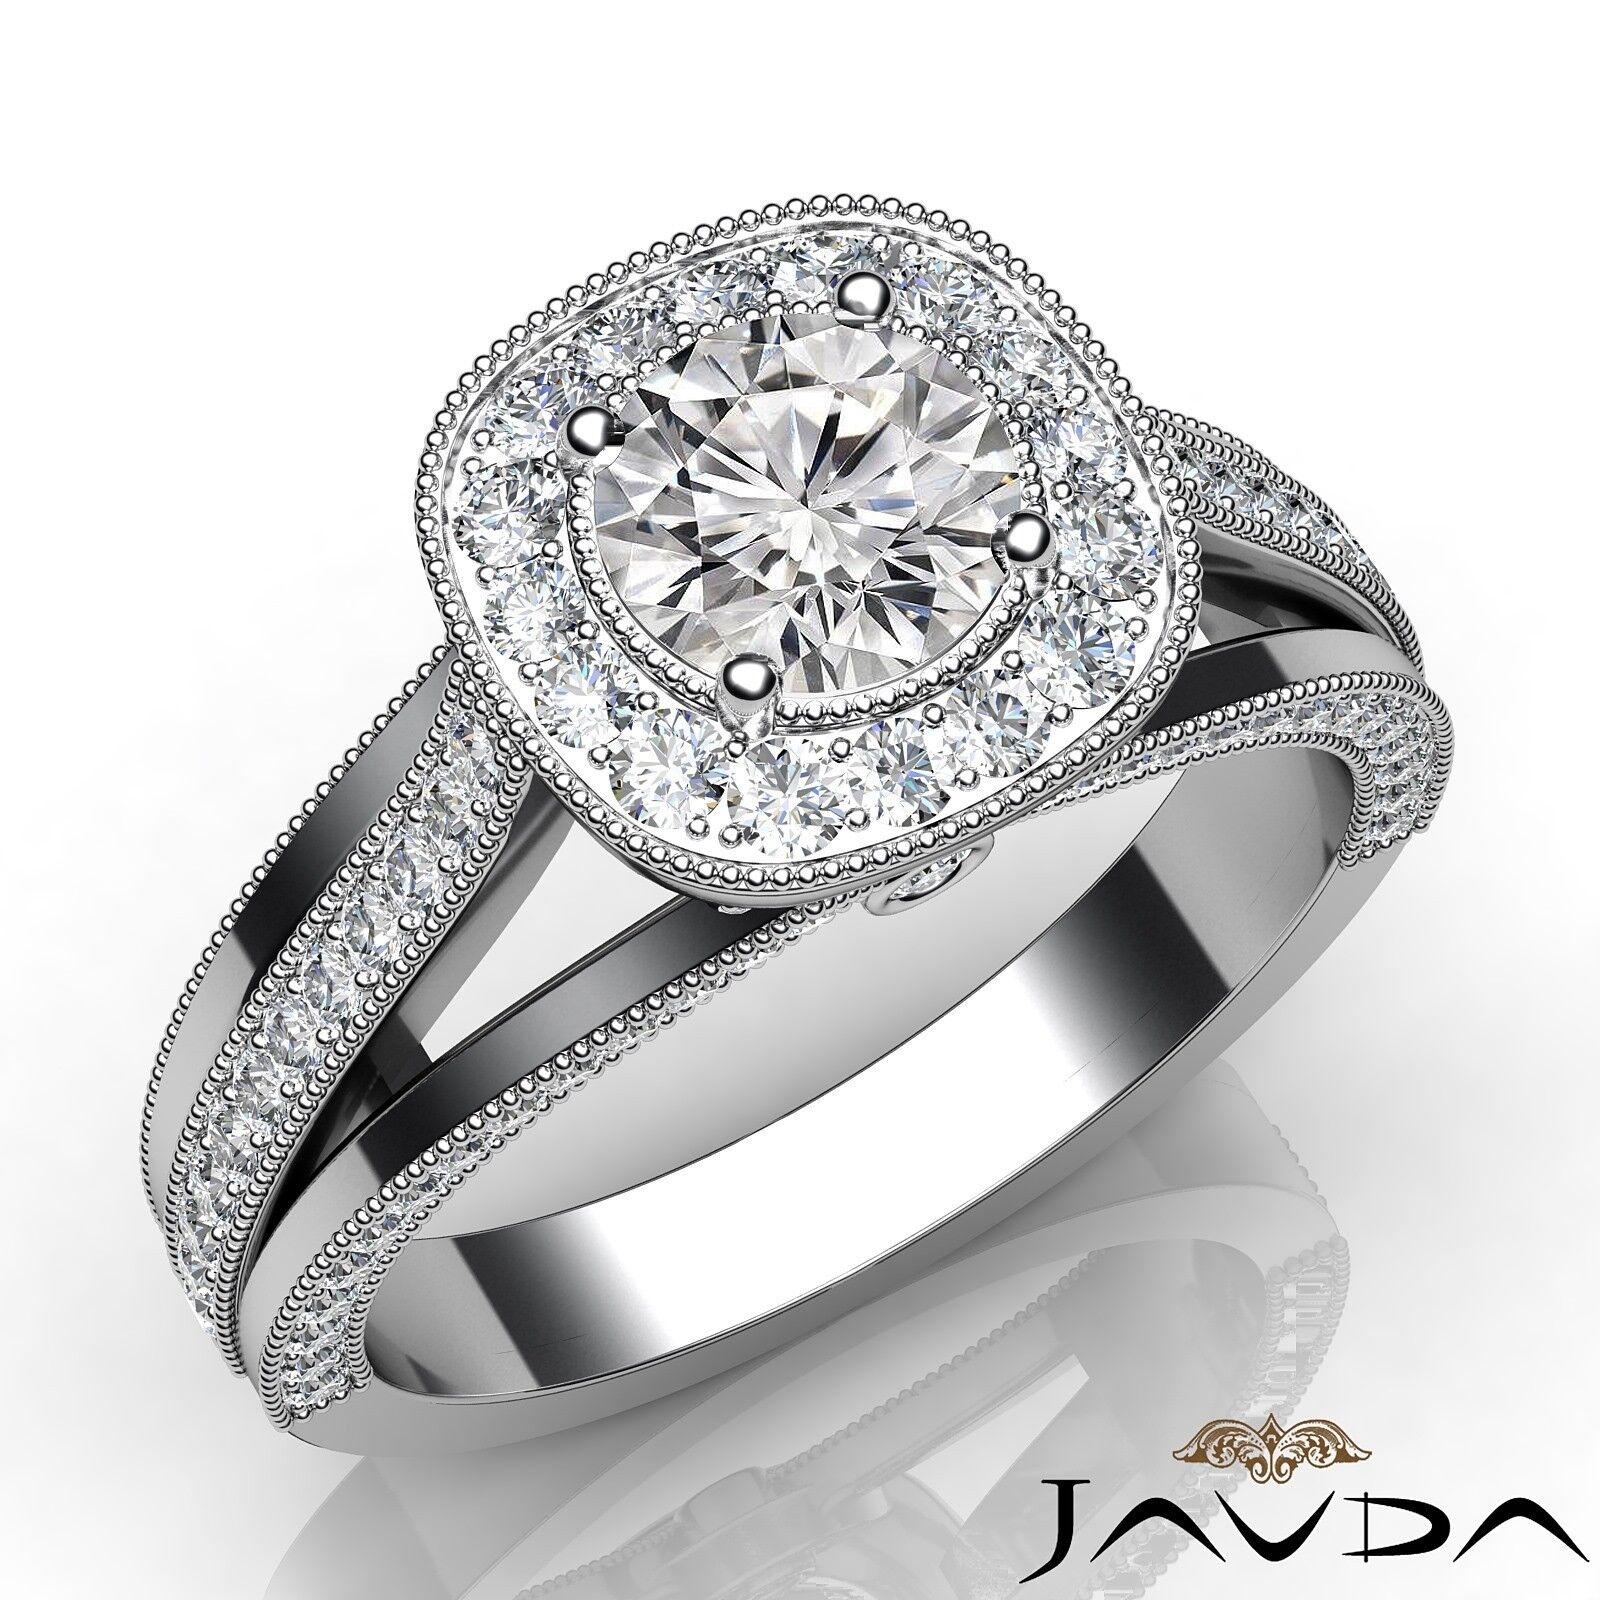 1.3ctw Gala Halo Pave Round Diamond Engagement Ring GIA E-VS2 White Gold Rings